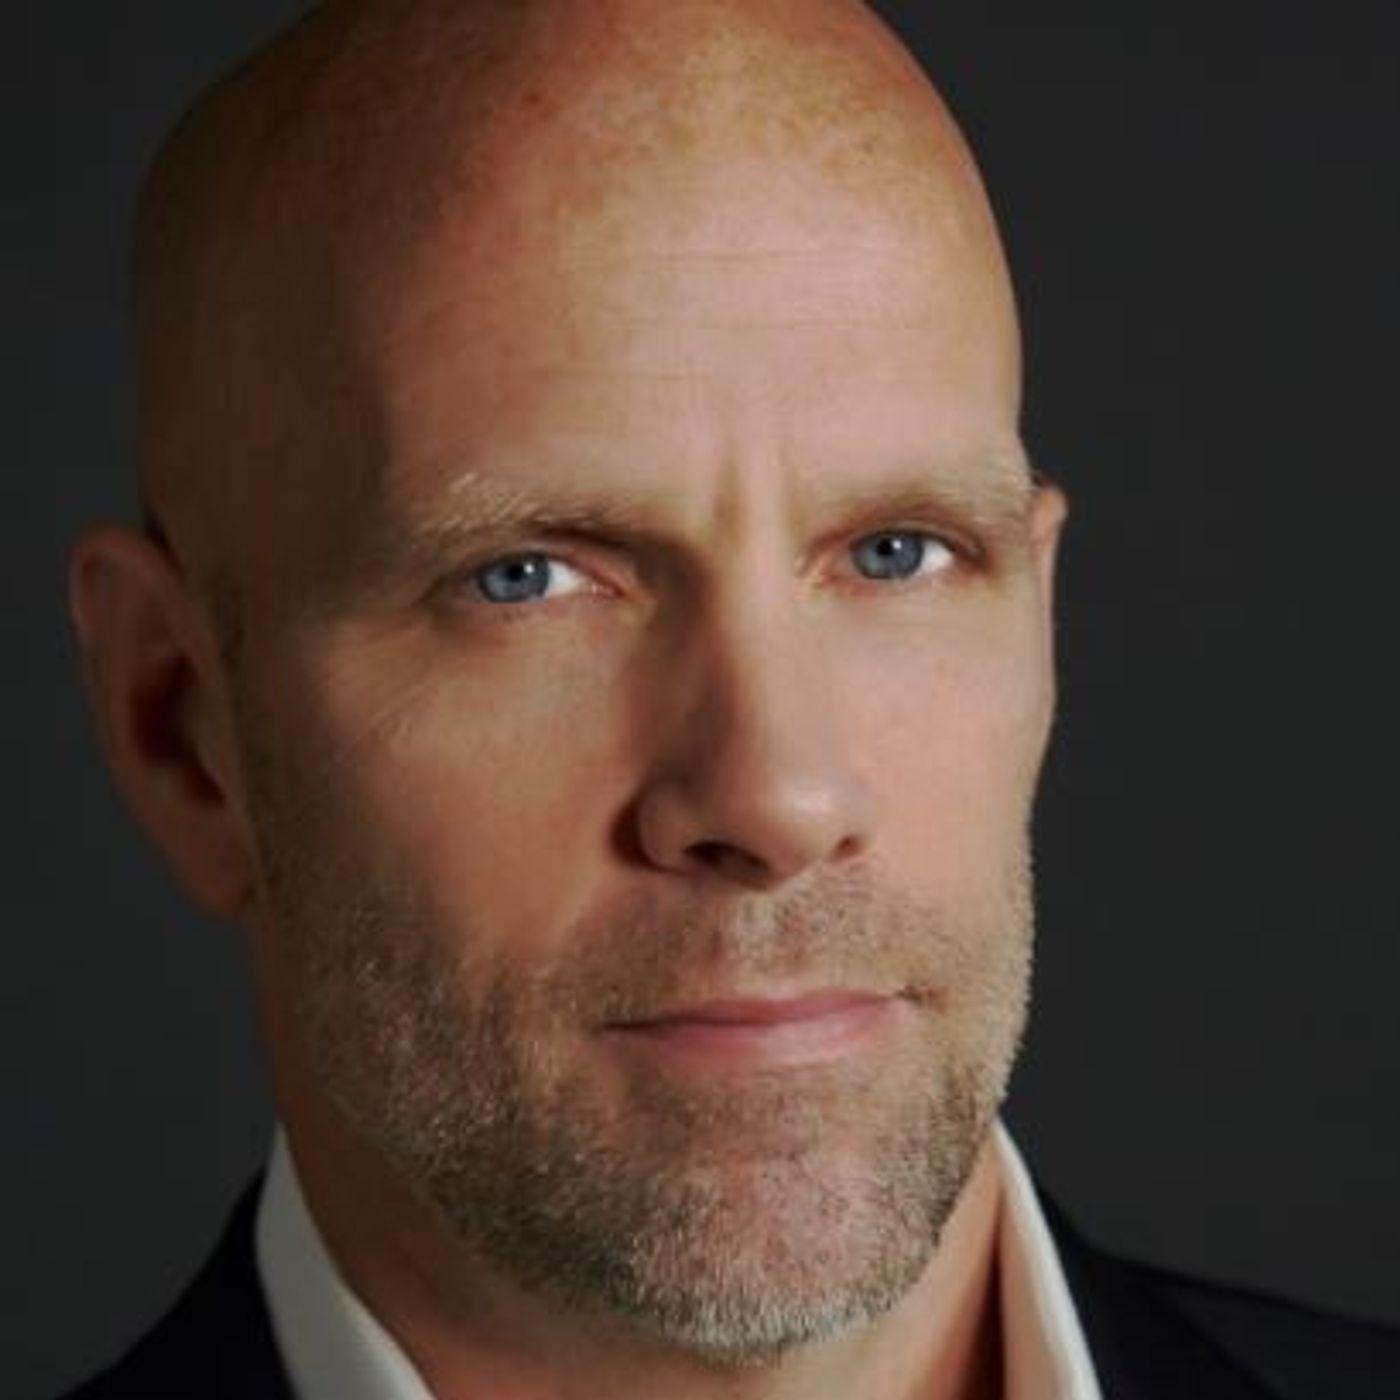 A Navy Seal, FBI agent and now Business Coach, Errol Doebler